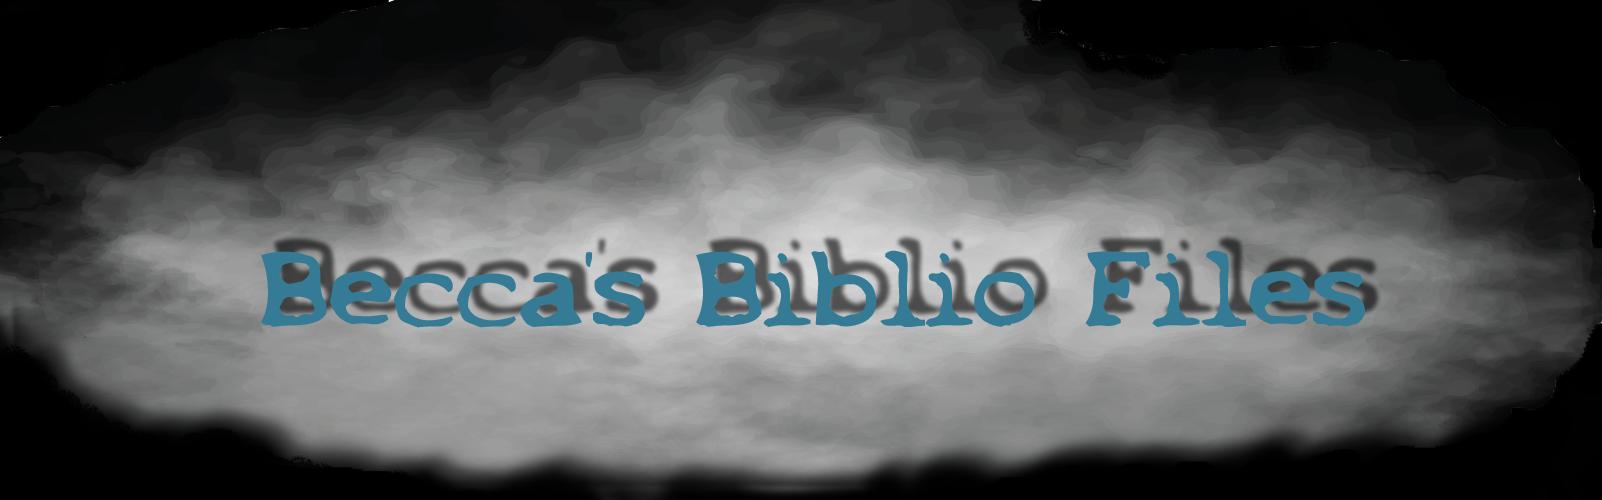 Becca's Biblio Files